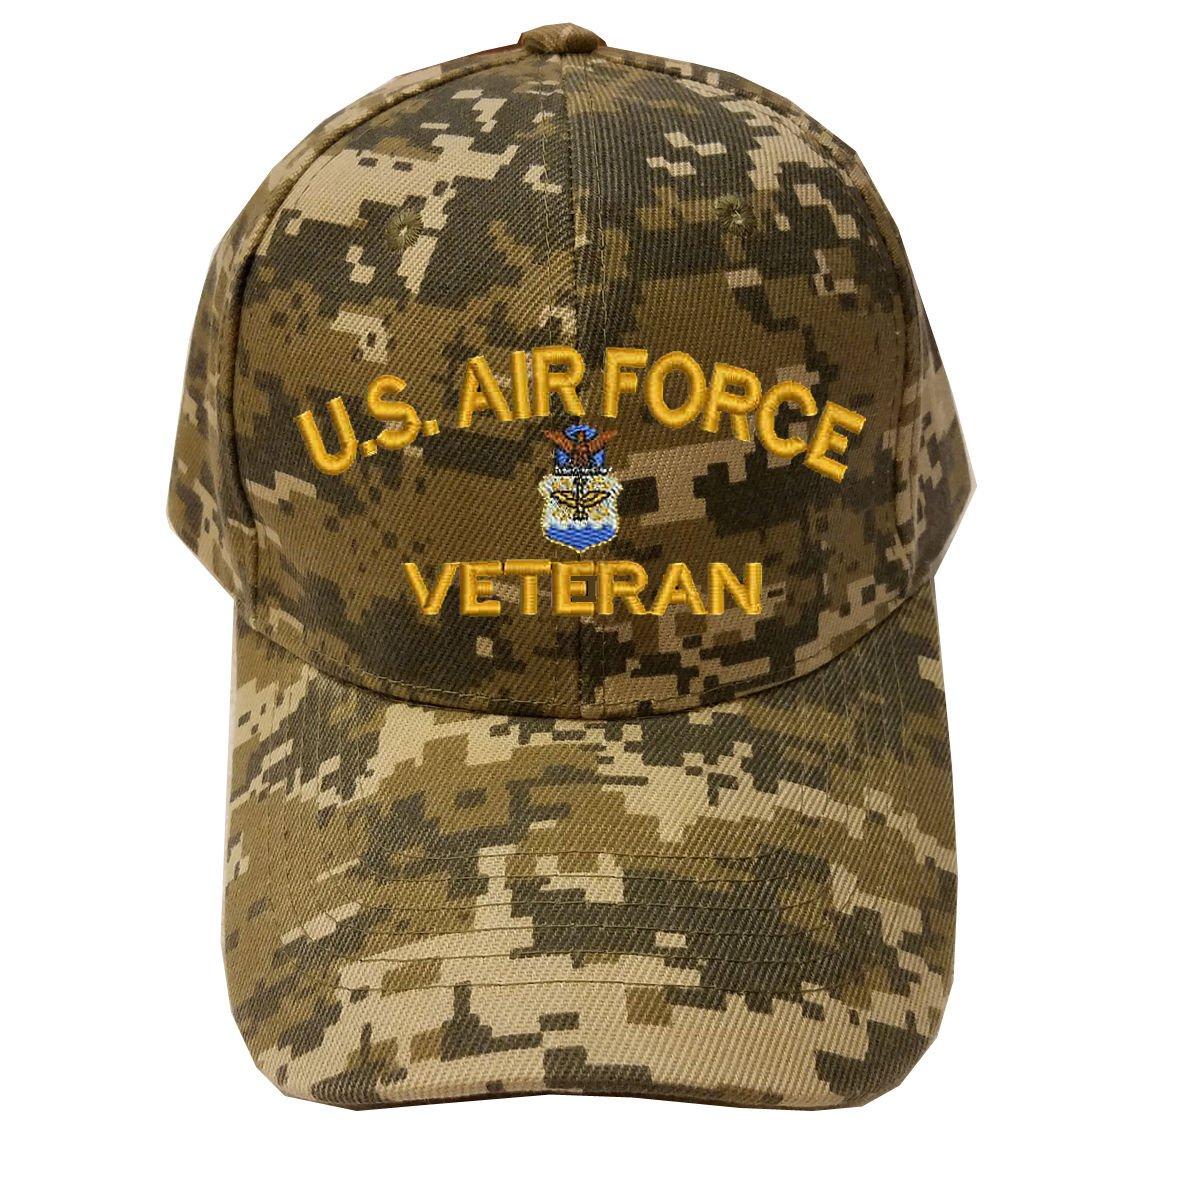 Military USAF U.S.Air force Veteran Digital Camo Baseball Cap Hat 1290a768d9a